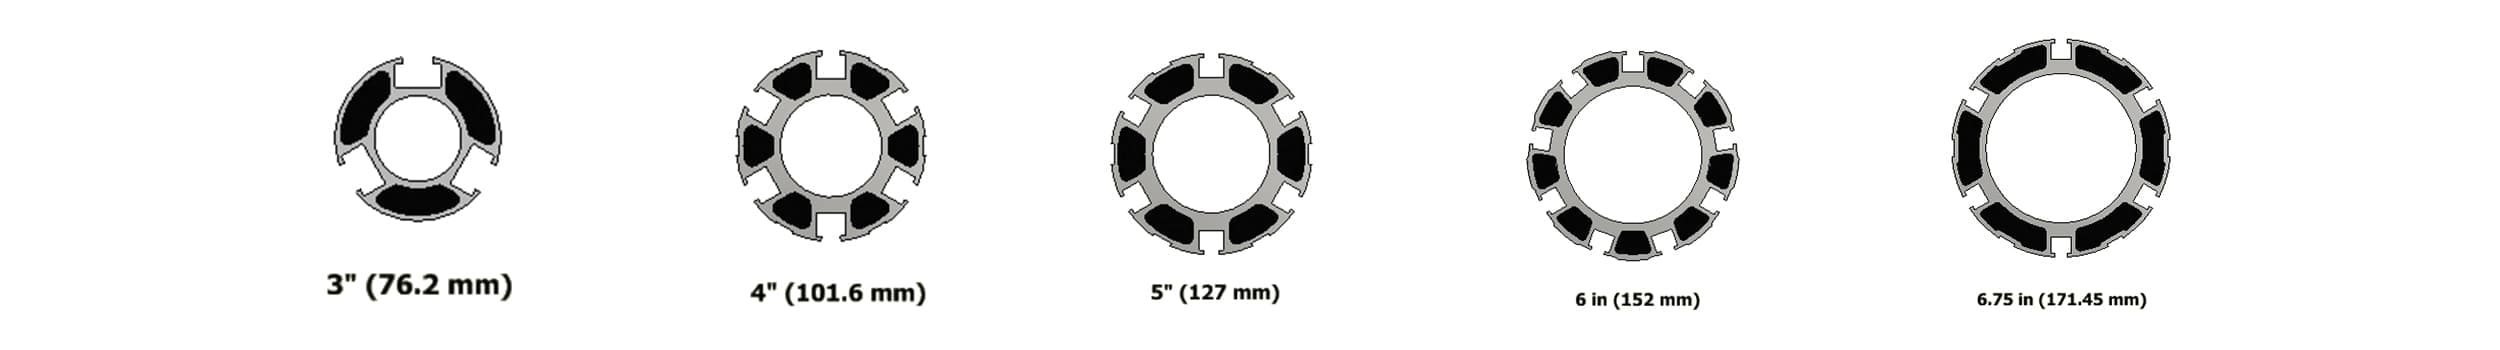 Carbon fiber shaft diameters